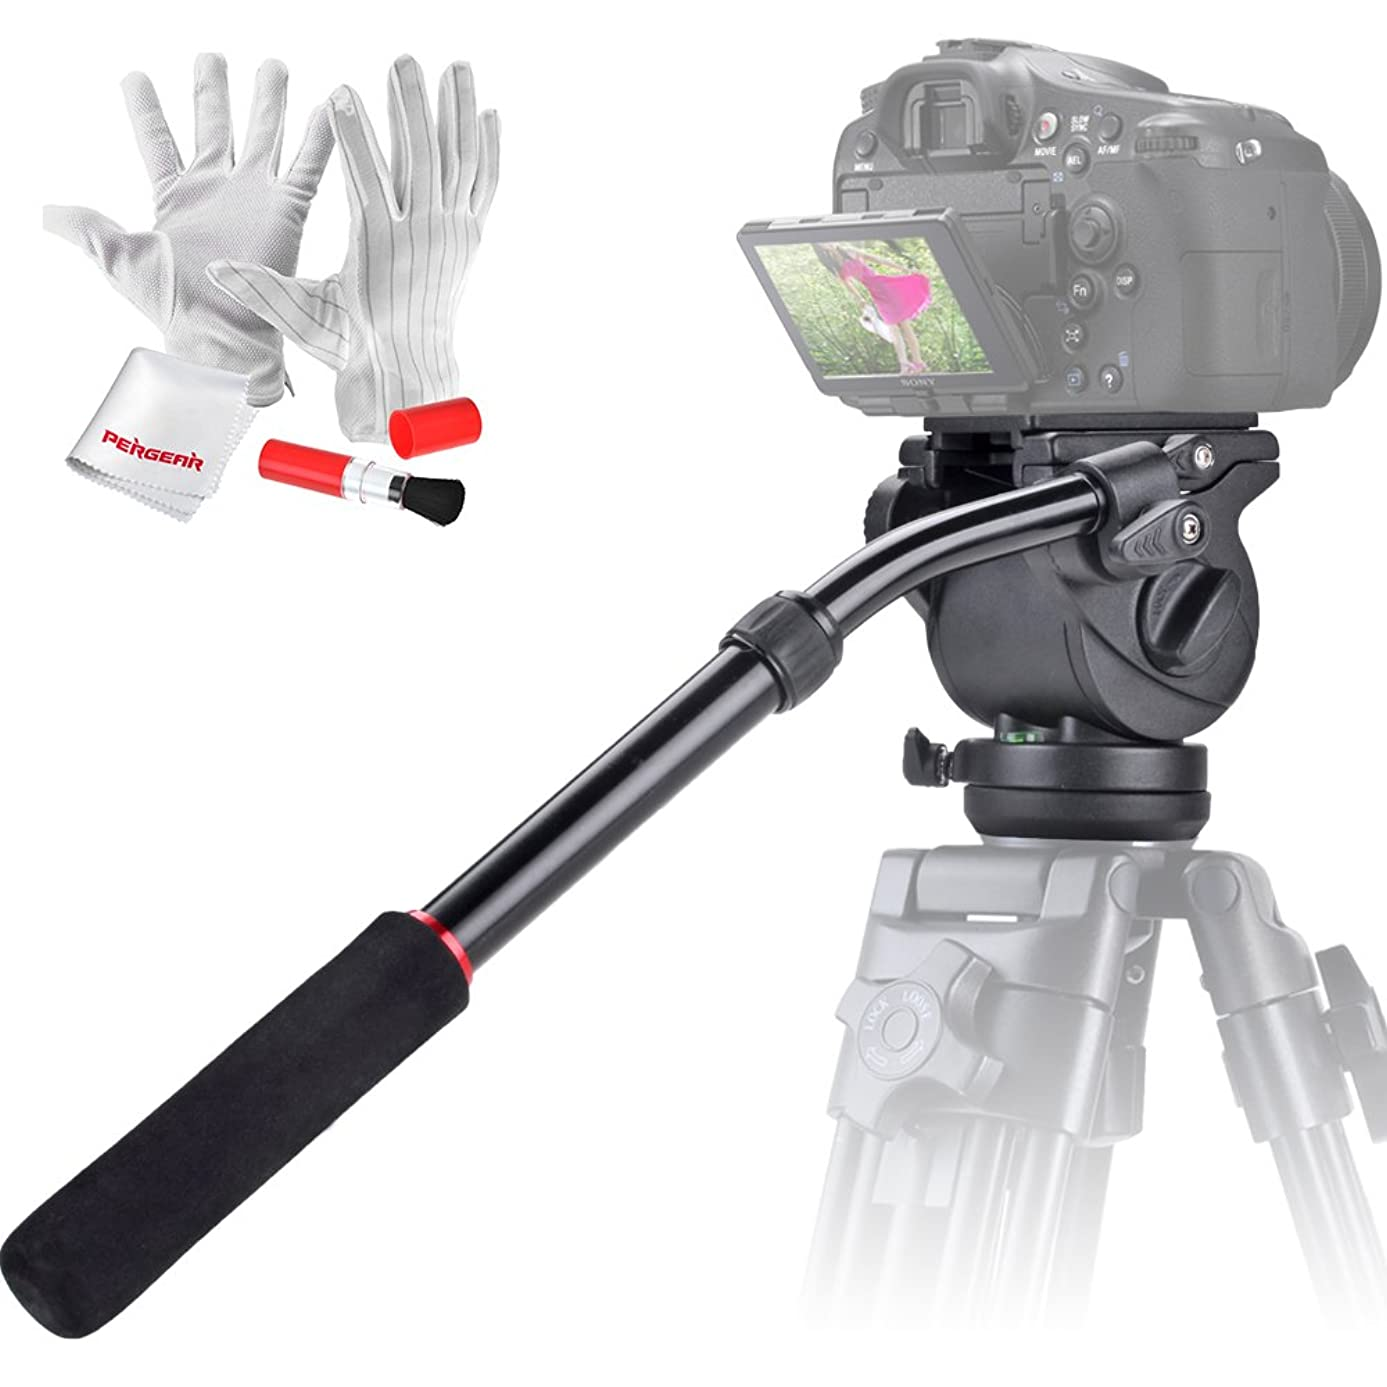 Emgreat® Video Camera Fluid Drag Tripod Head and Handle